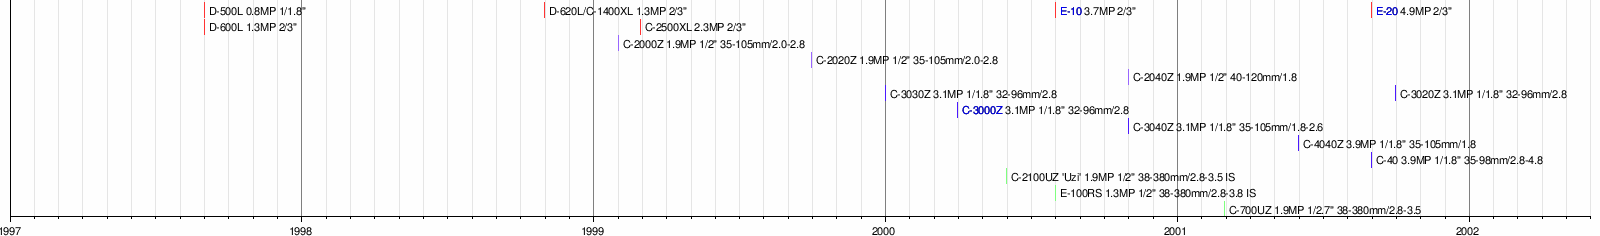 timeline of olympus creative digital cameras